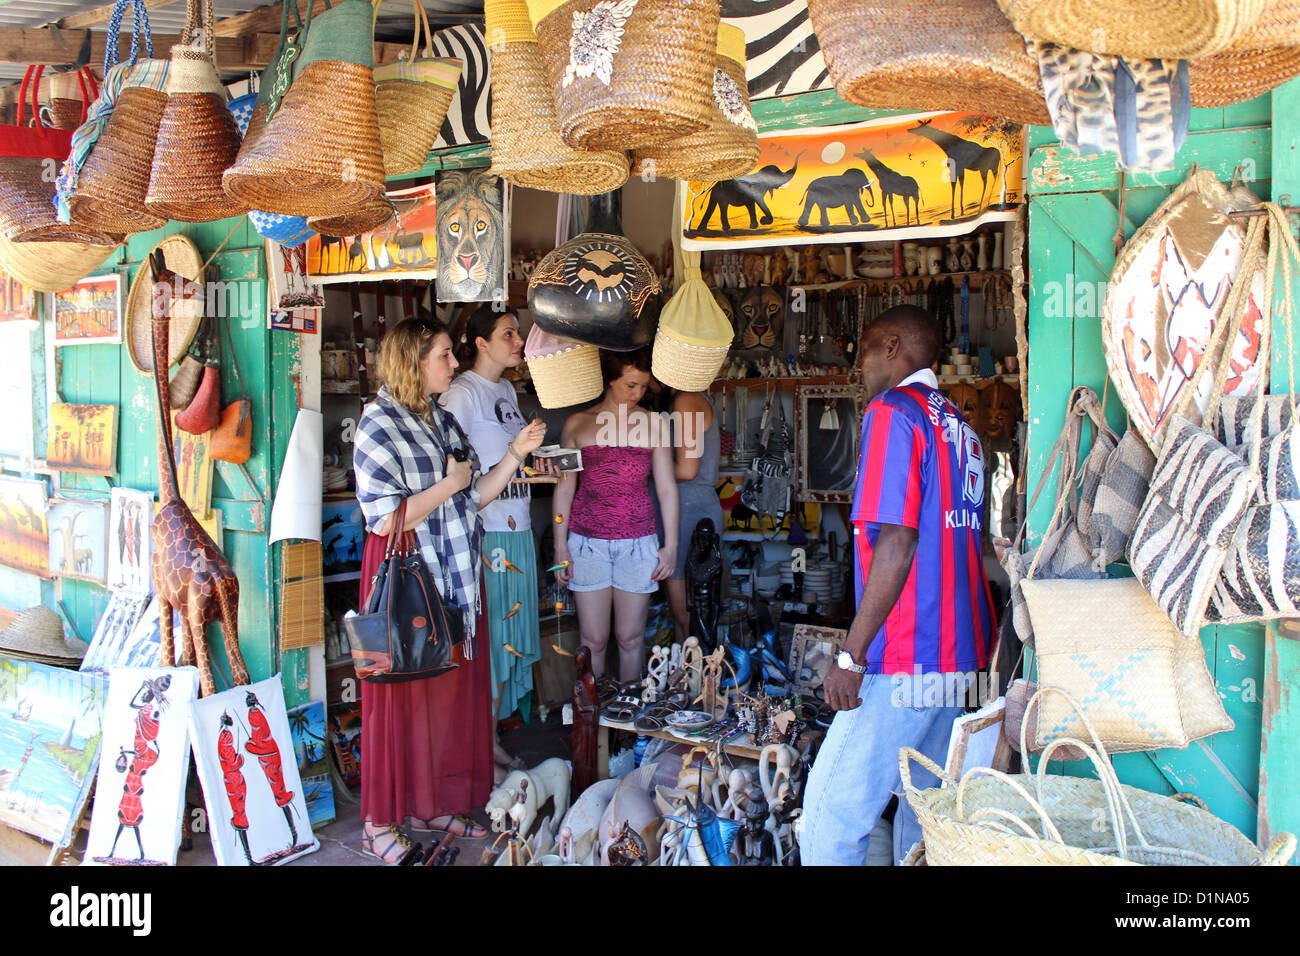 Fatte a mano Arte e mercato di souvenir, Malindi in Kenya, Africa orientale Immagini Stock